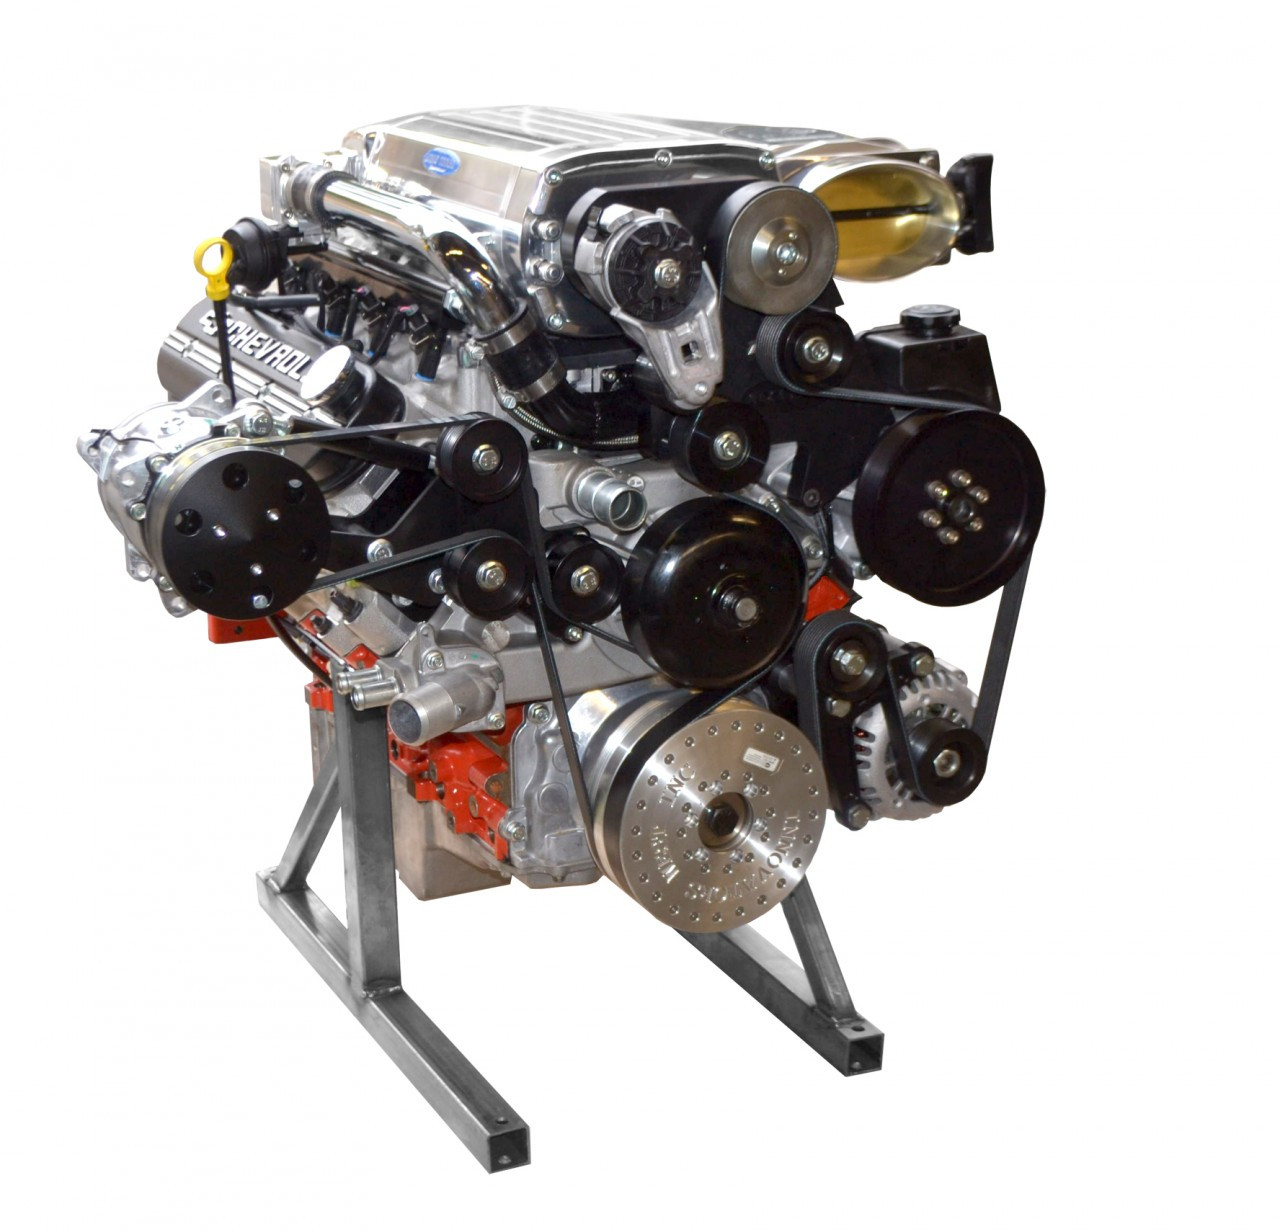 Supercharged Ecotec Engine: LSX 454ci 880 HP Supercharged Turn Key Engine Assembly